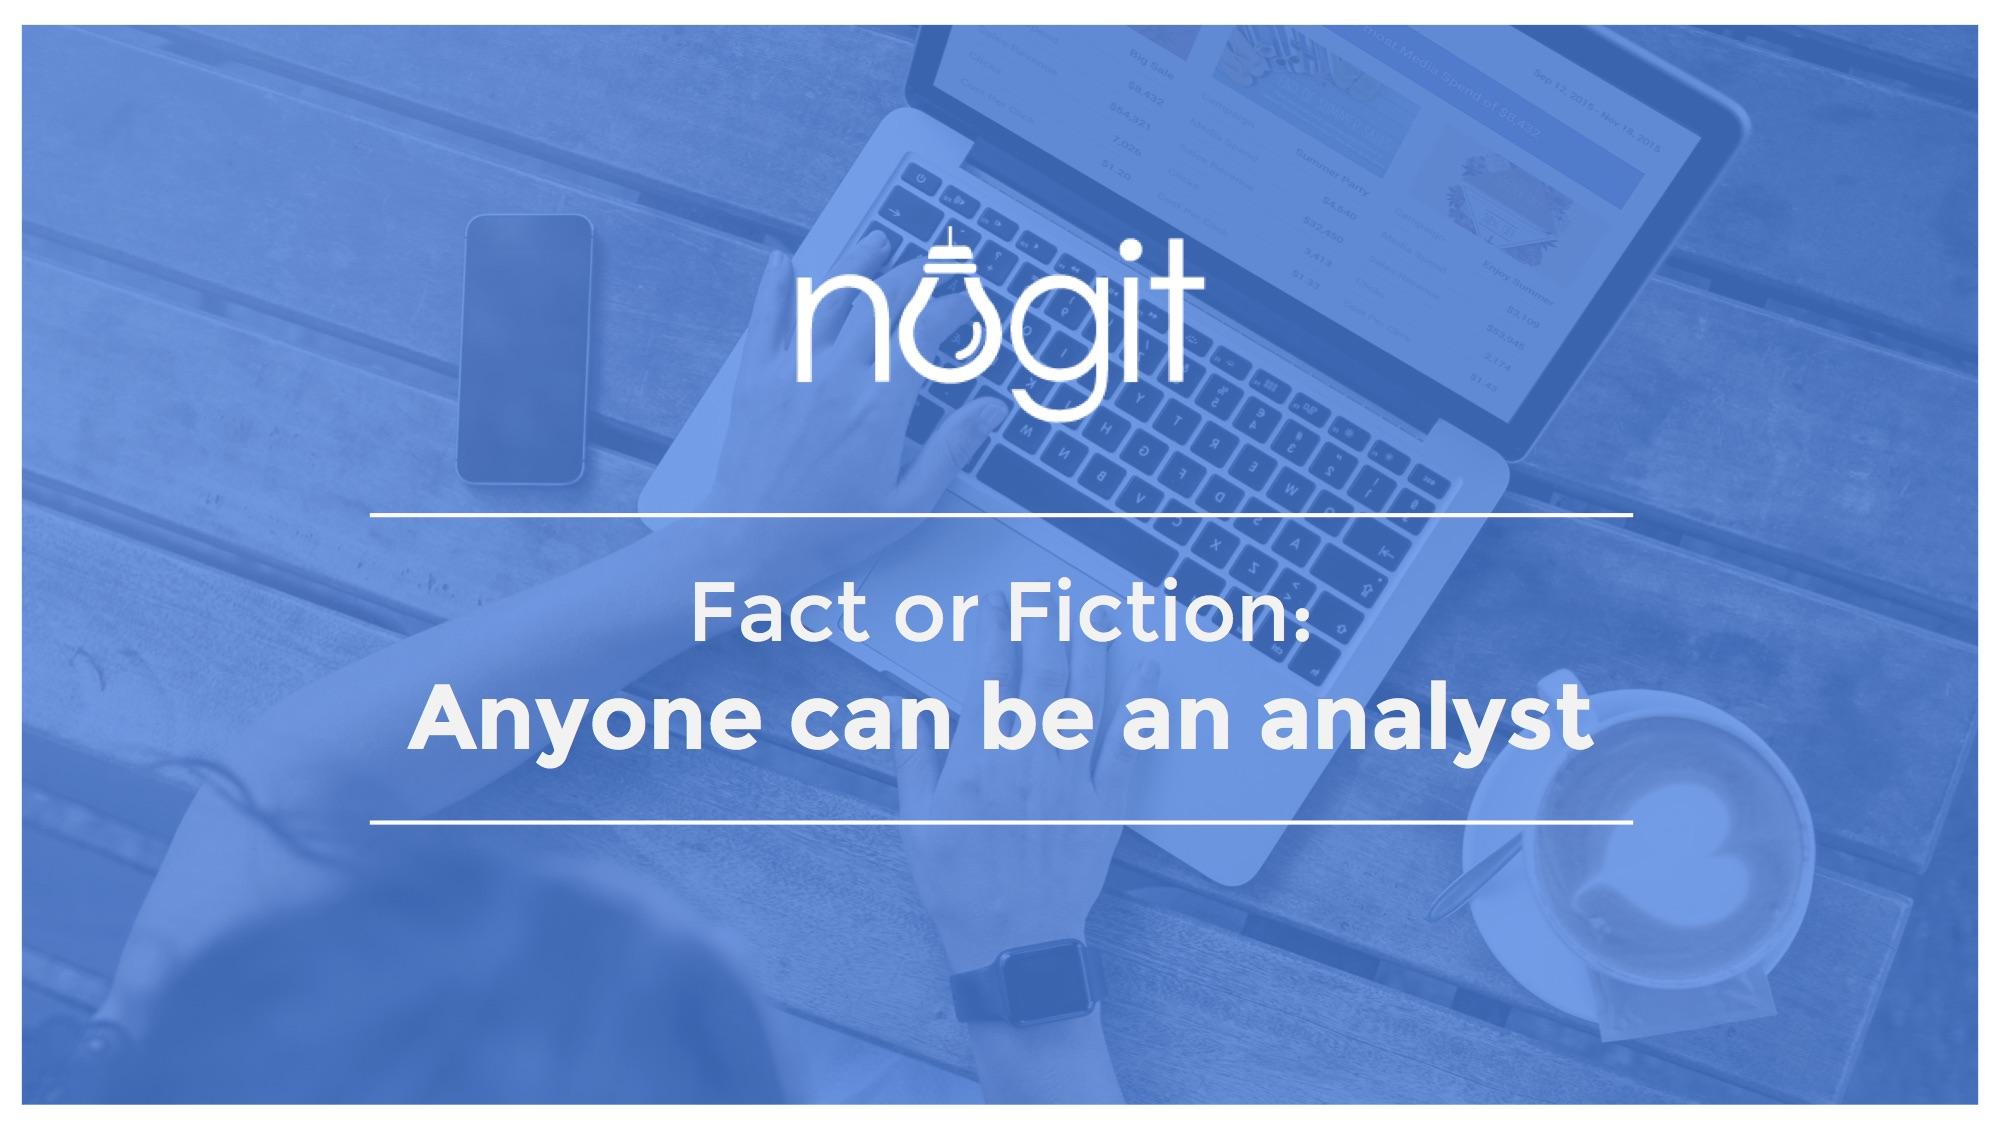 Gartner Nugit Anyone can be an analyst